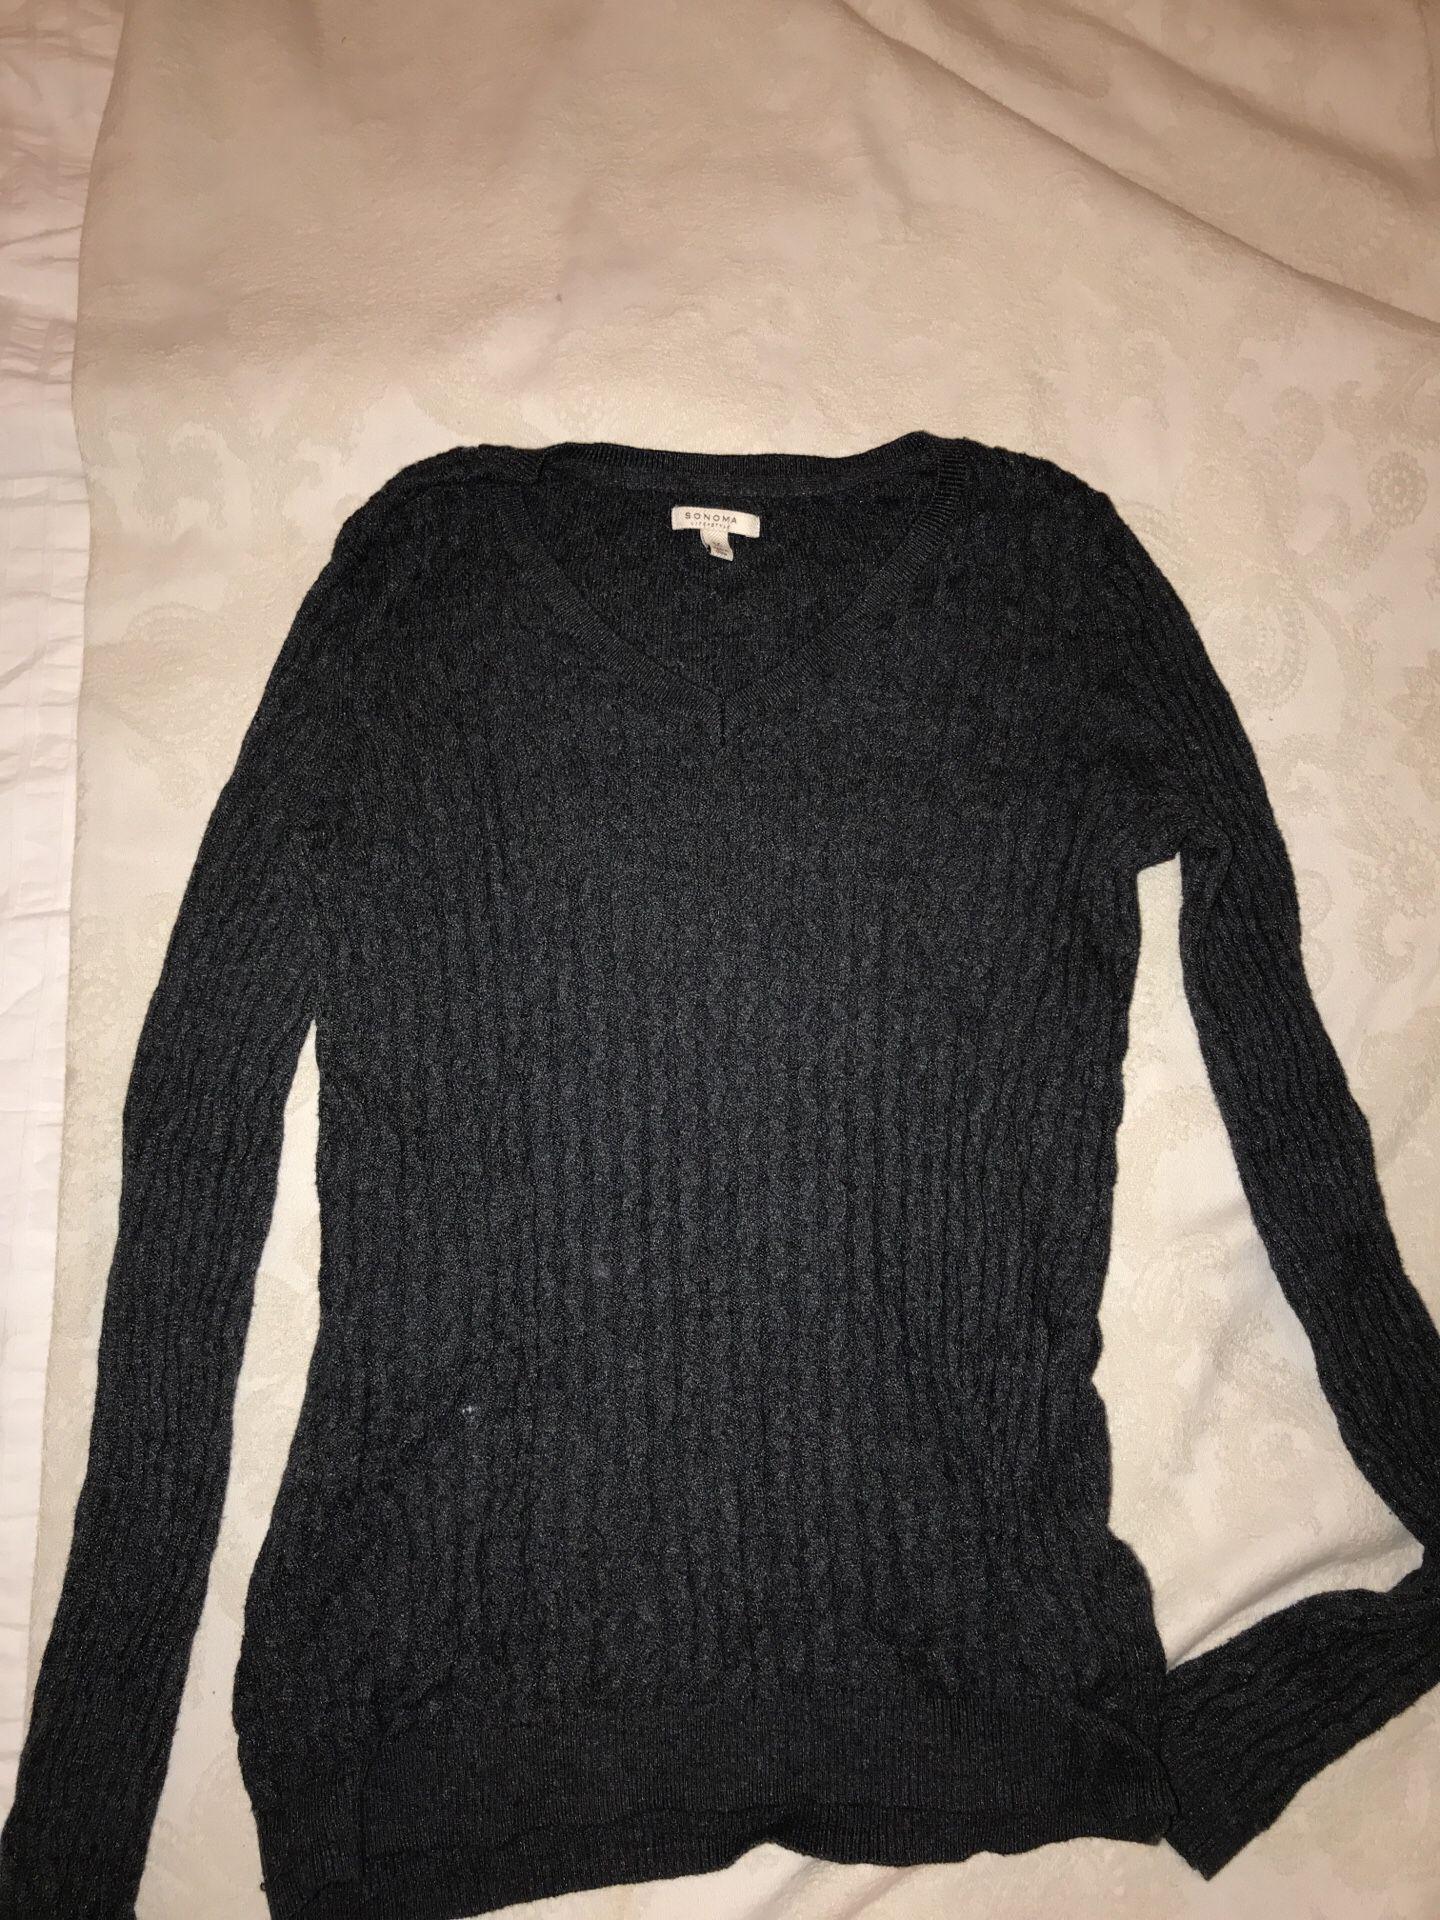 Women's grey sweater